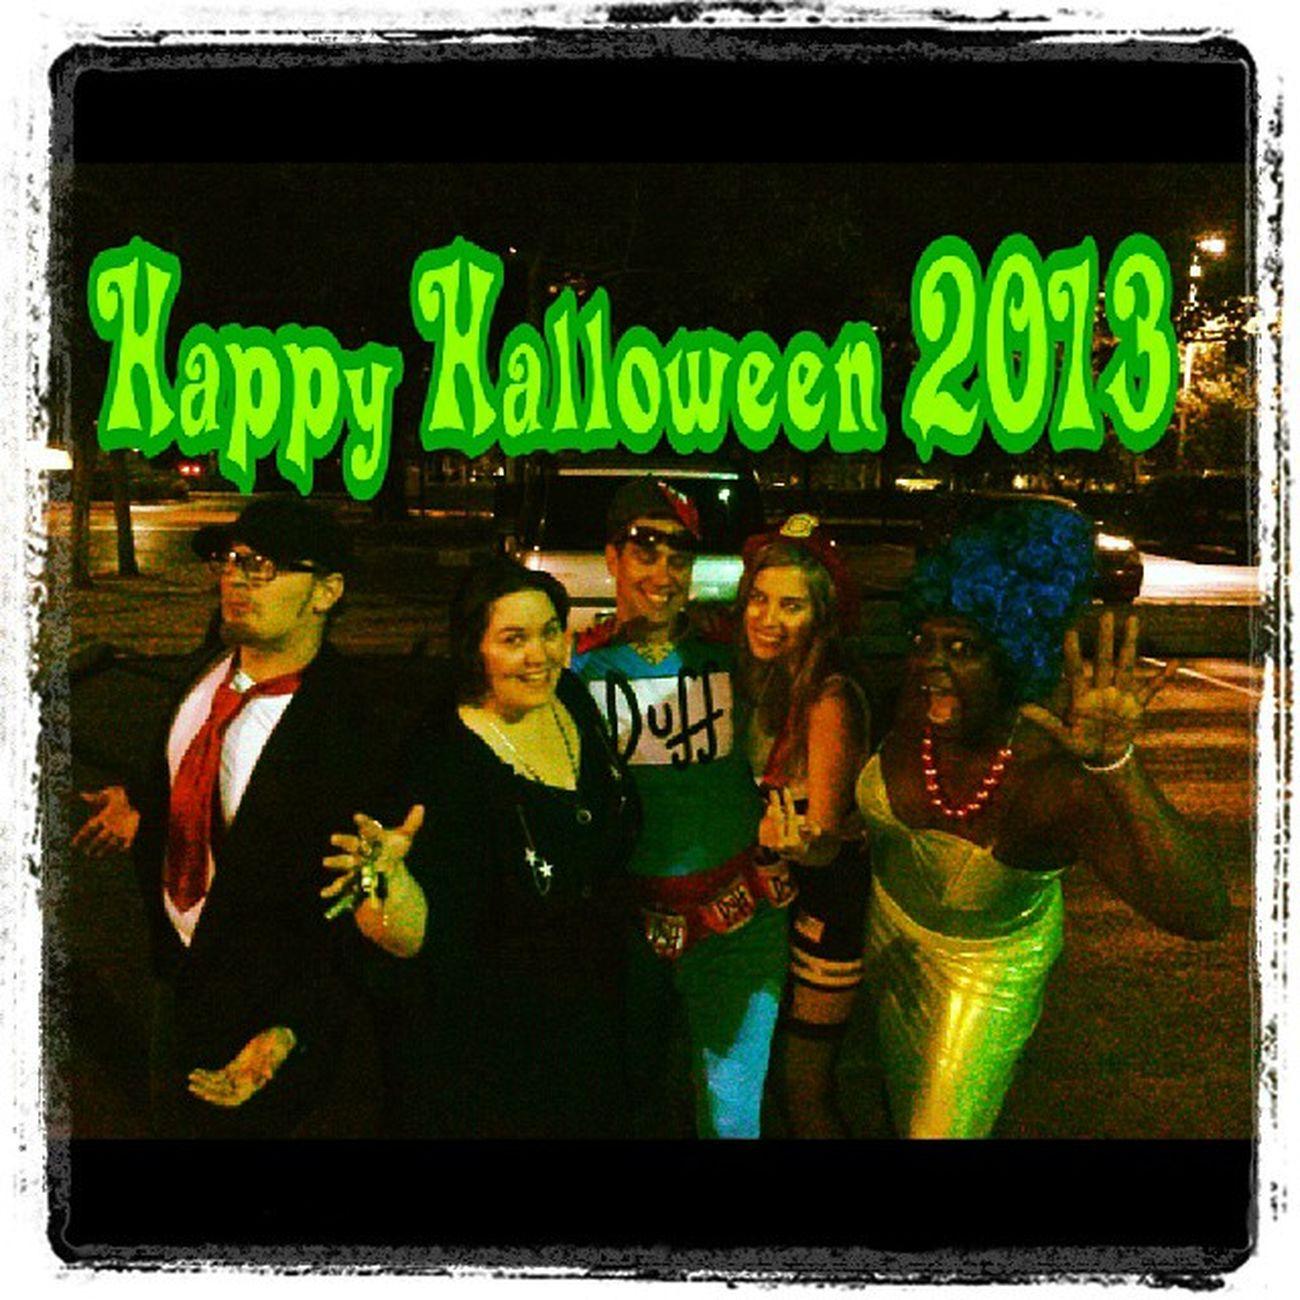 Happy Halloween 2013 Halloween2013 Halloween Duffys GoodTimes parkinglot @bigrob420